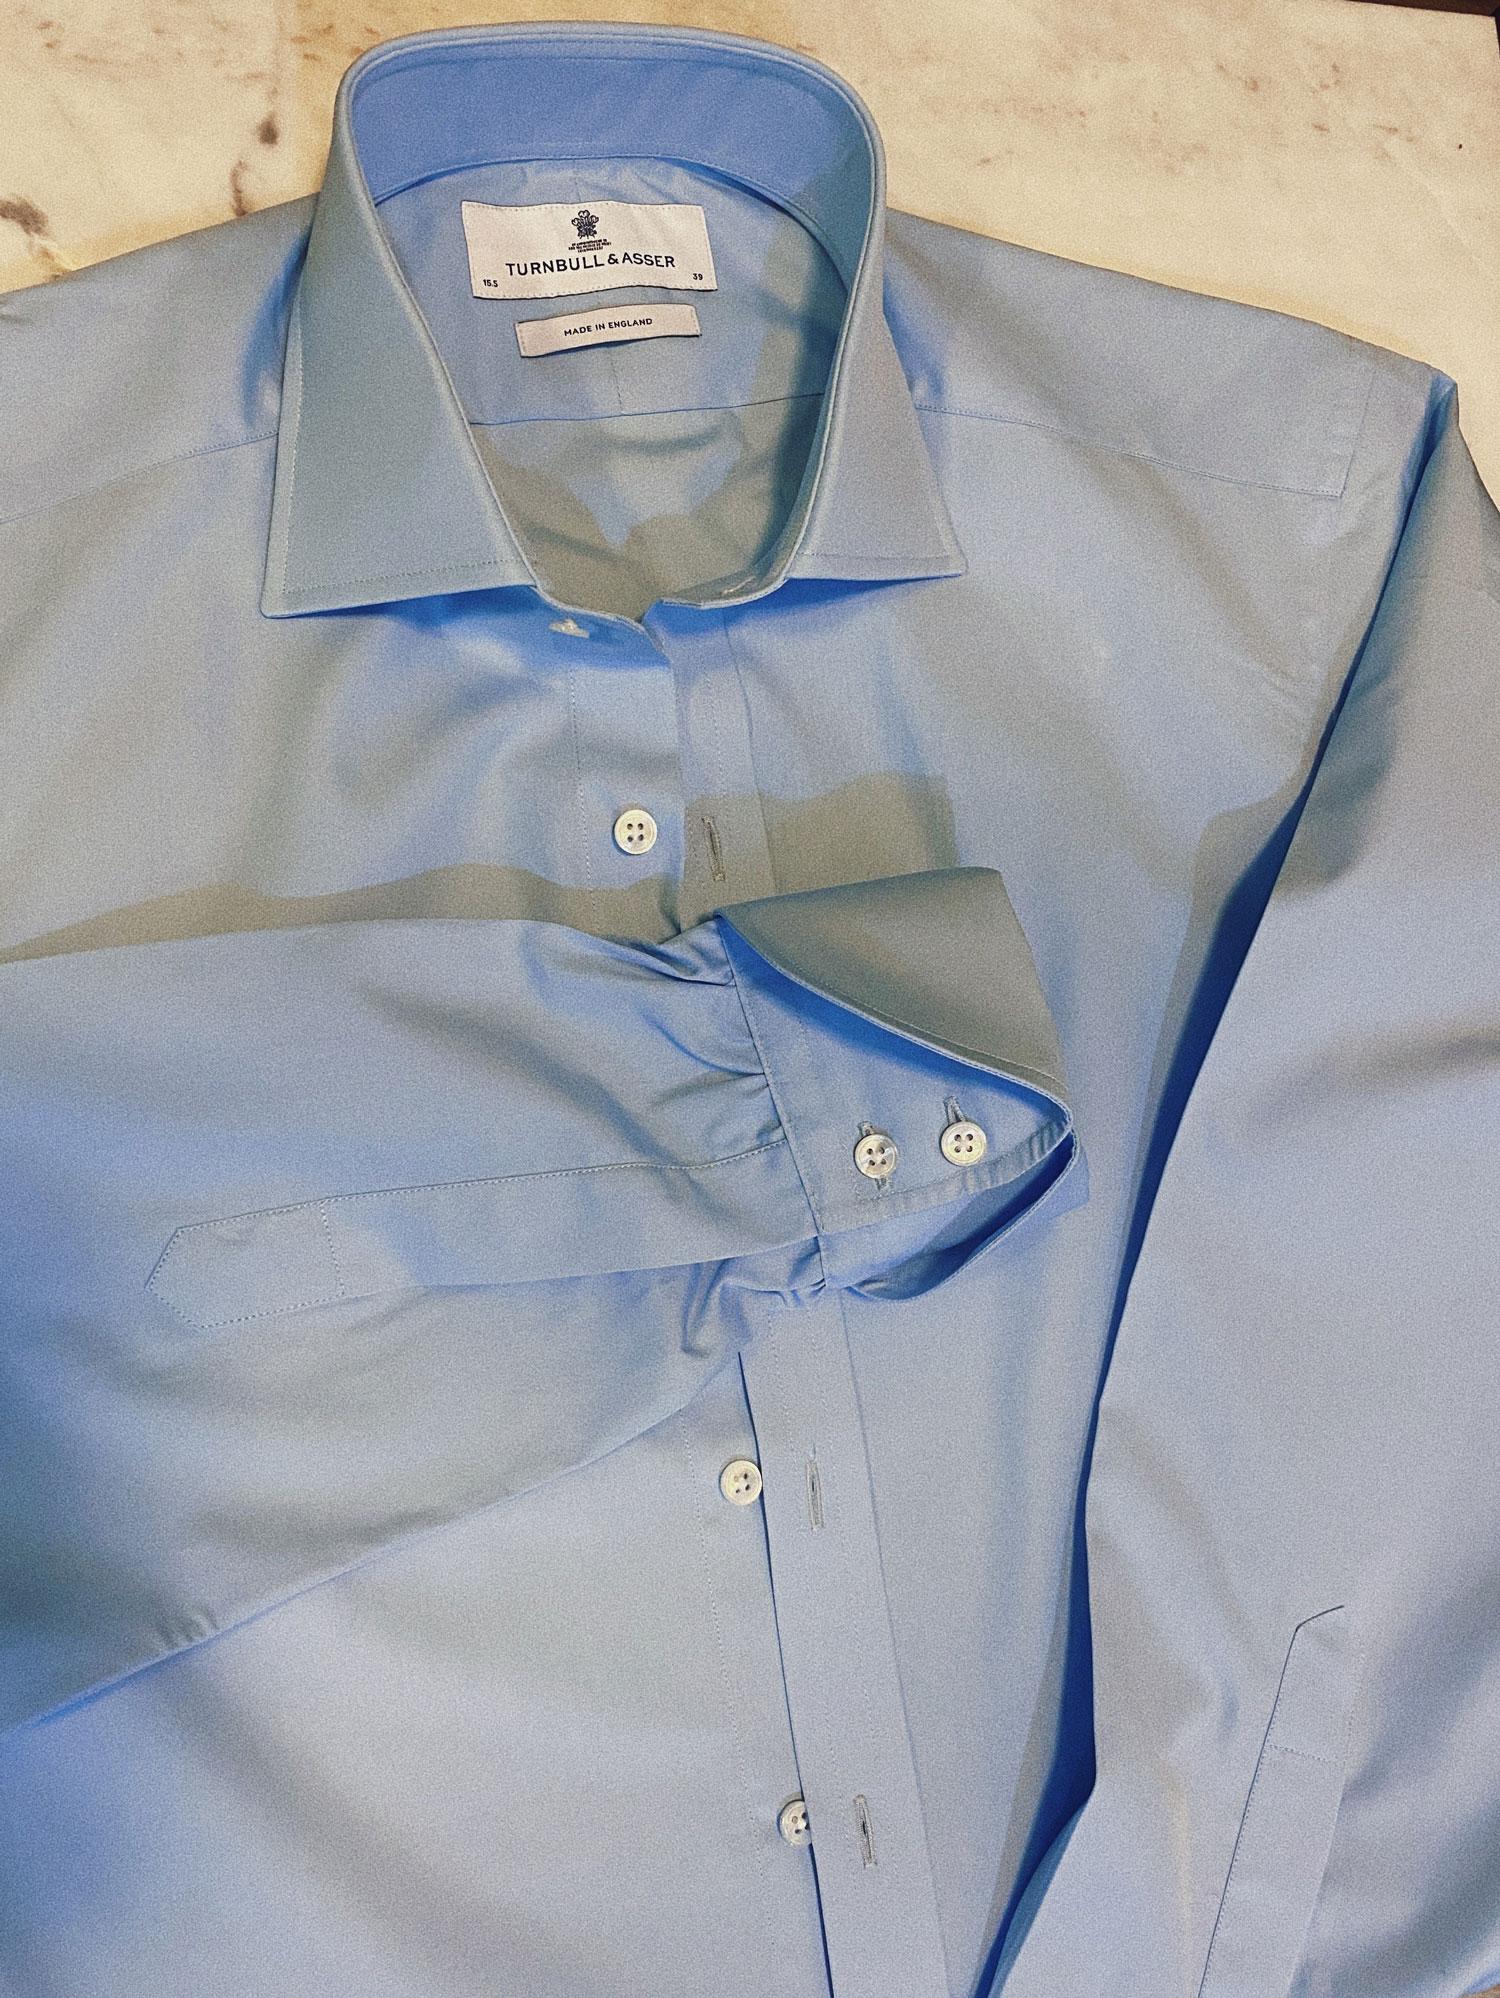 Cocktail Cuffs Turnbull & Asser shirt blue cotton flat lay